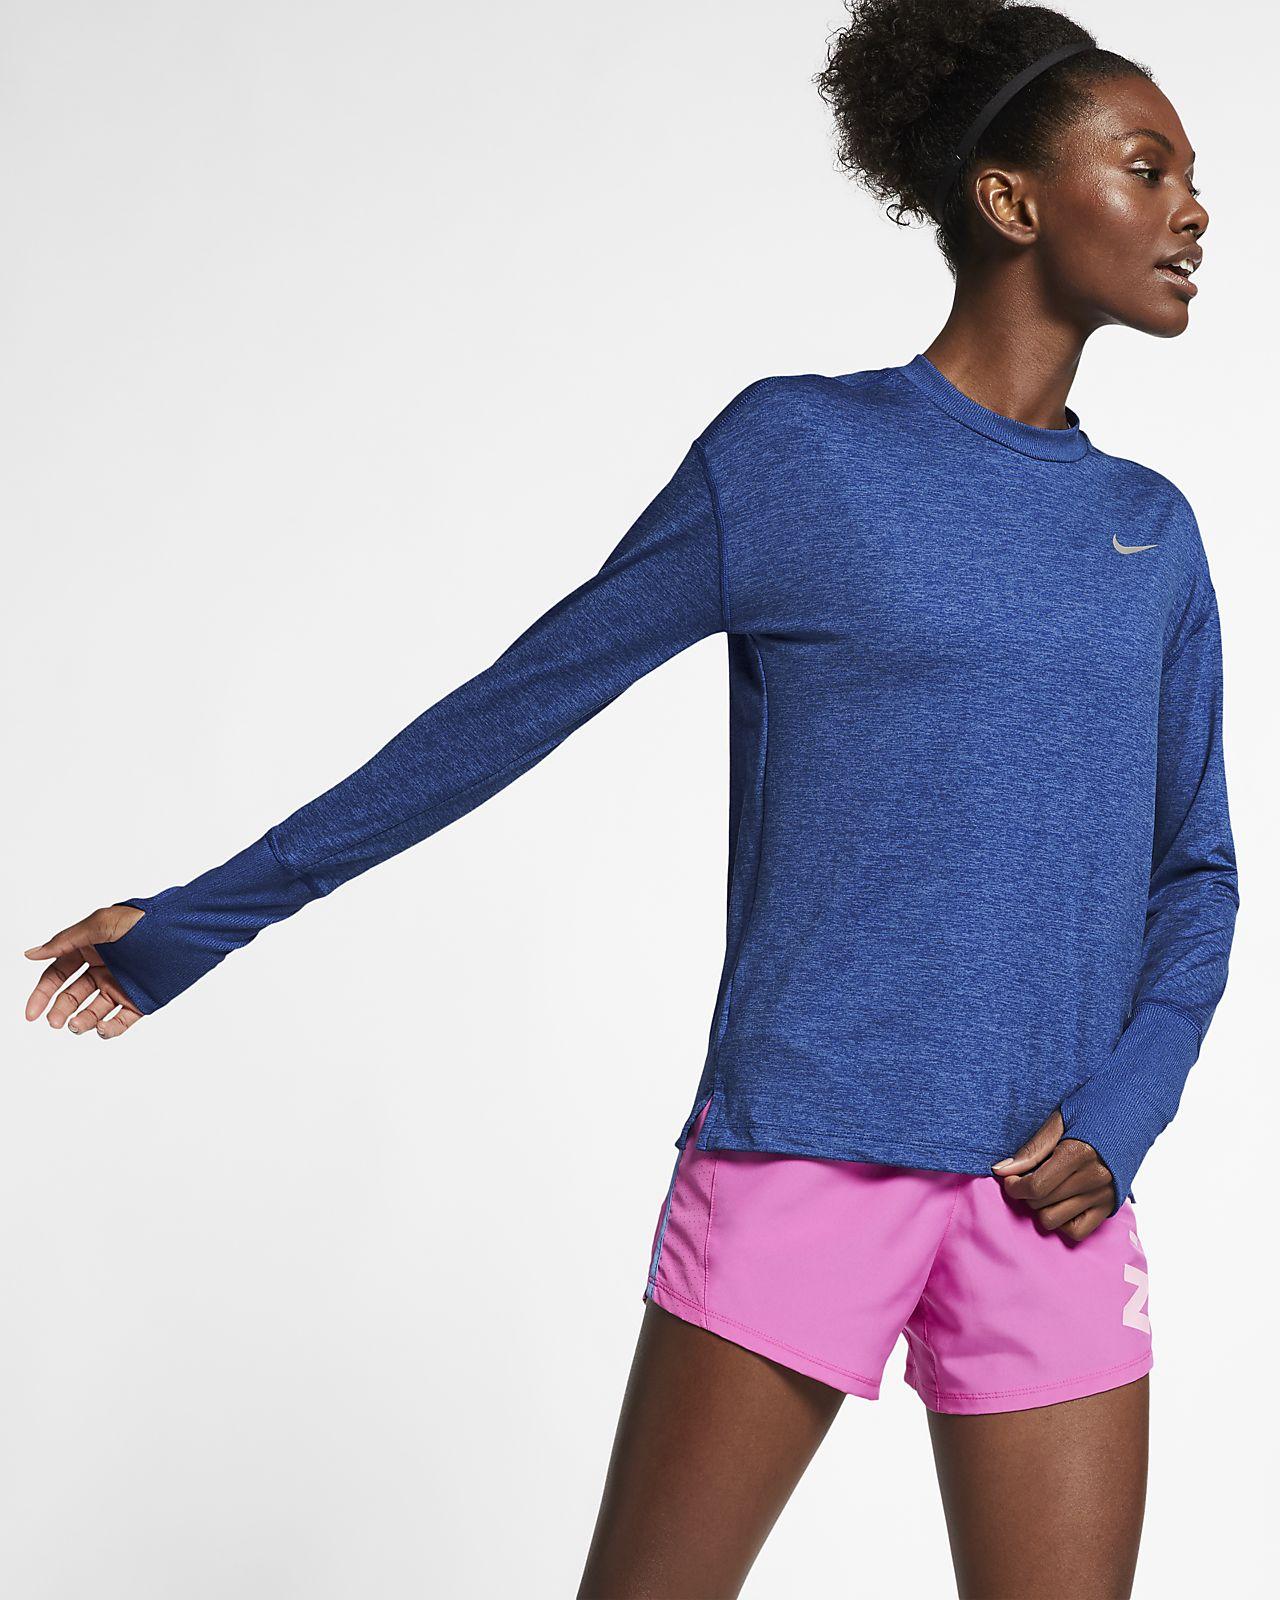 dd97483037c707 Nike Element Women s Running Top. Nike.com